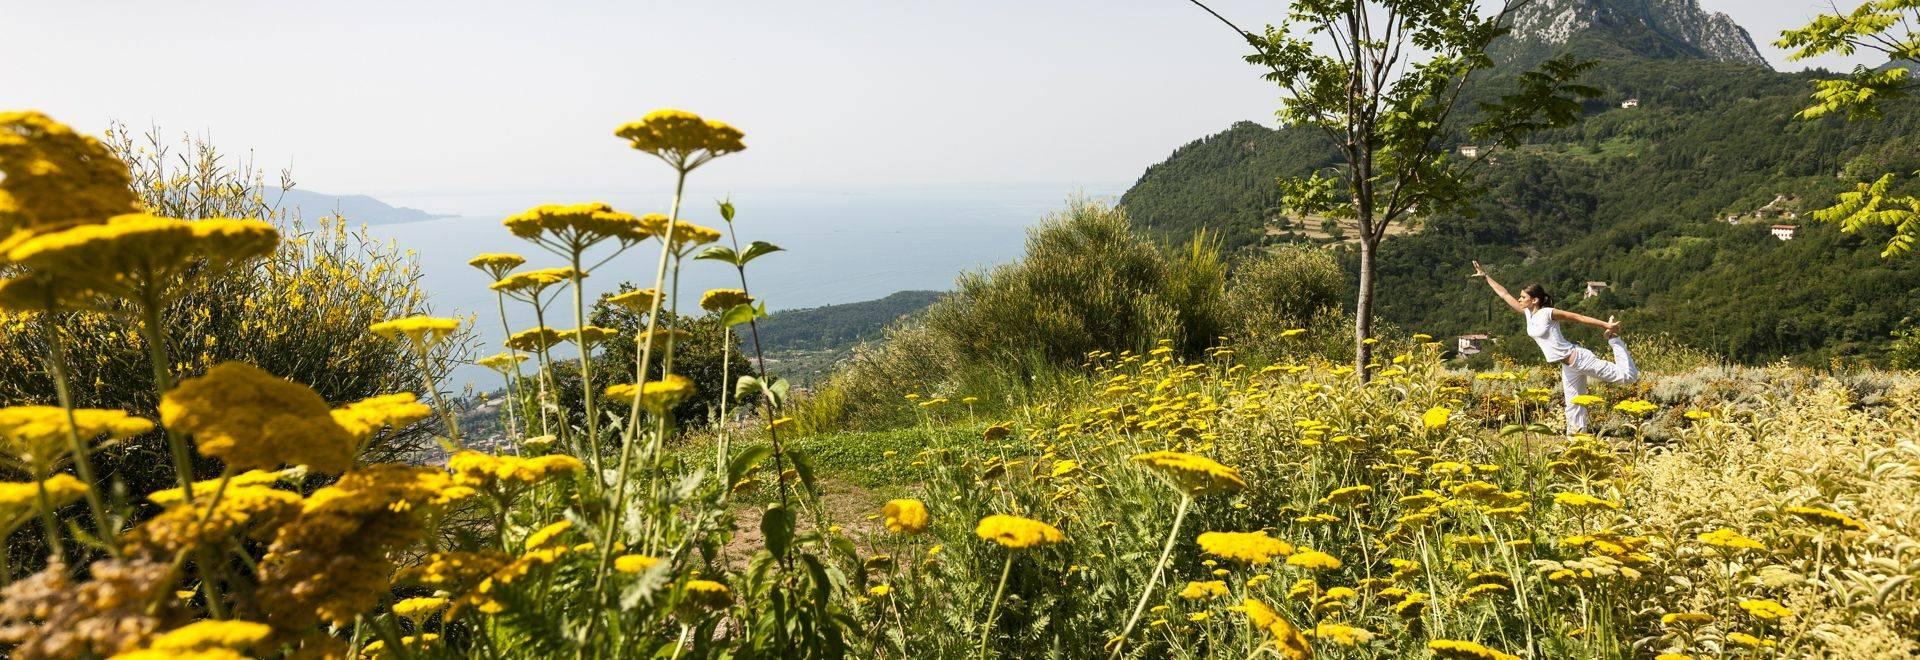 Italy; Lago di Garda; Lefay Resort and Spa; Via Feltrinelli 118; 25084 Gargnano. www.lefayresorts.com, Therapeutic Gardens